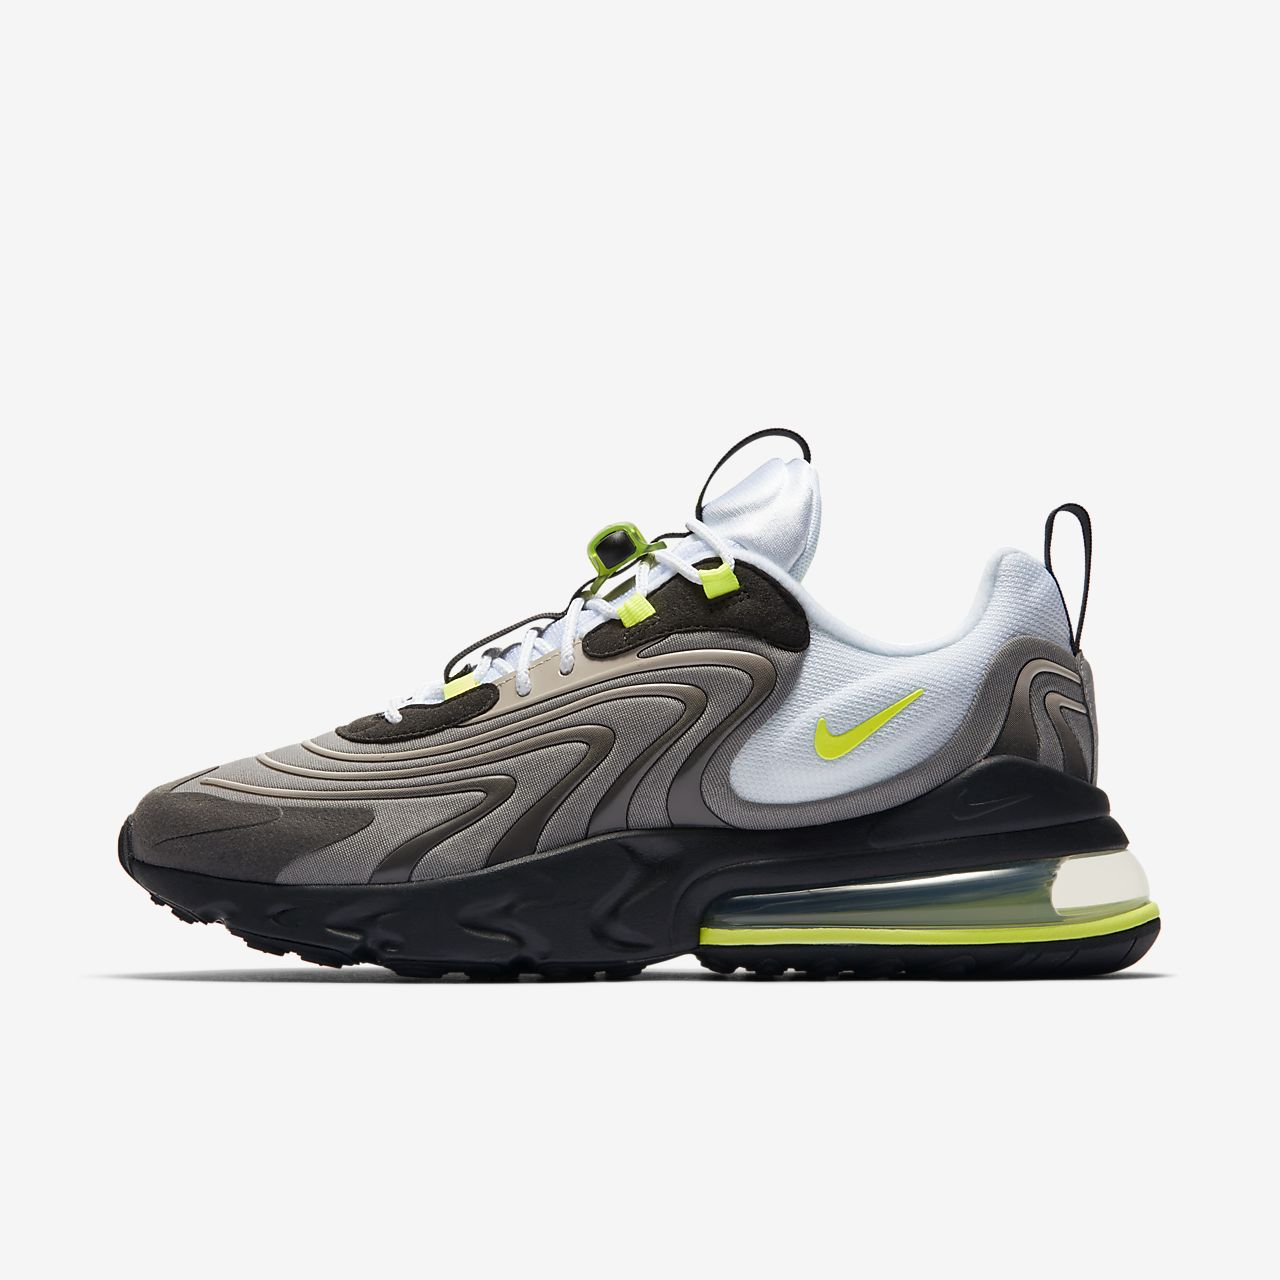 Buty męskie Nike Air Max 270 ENG